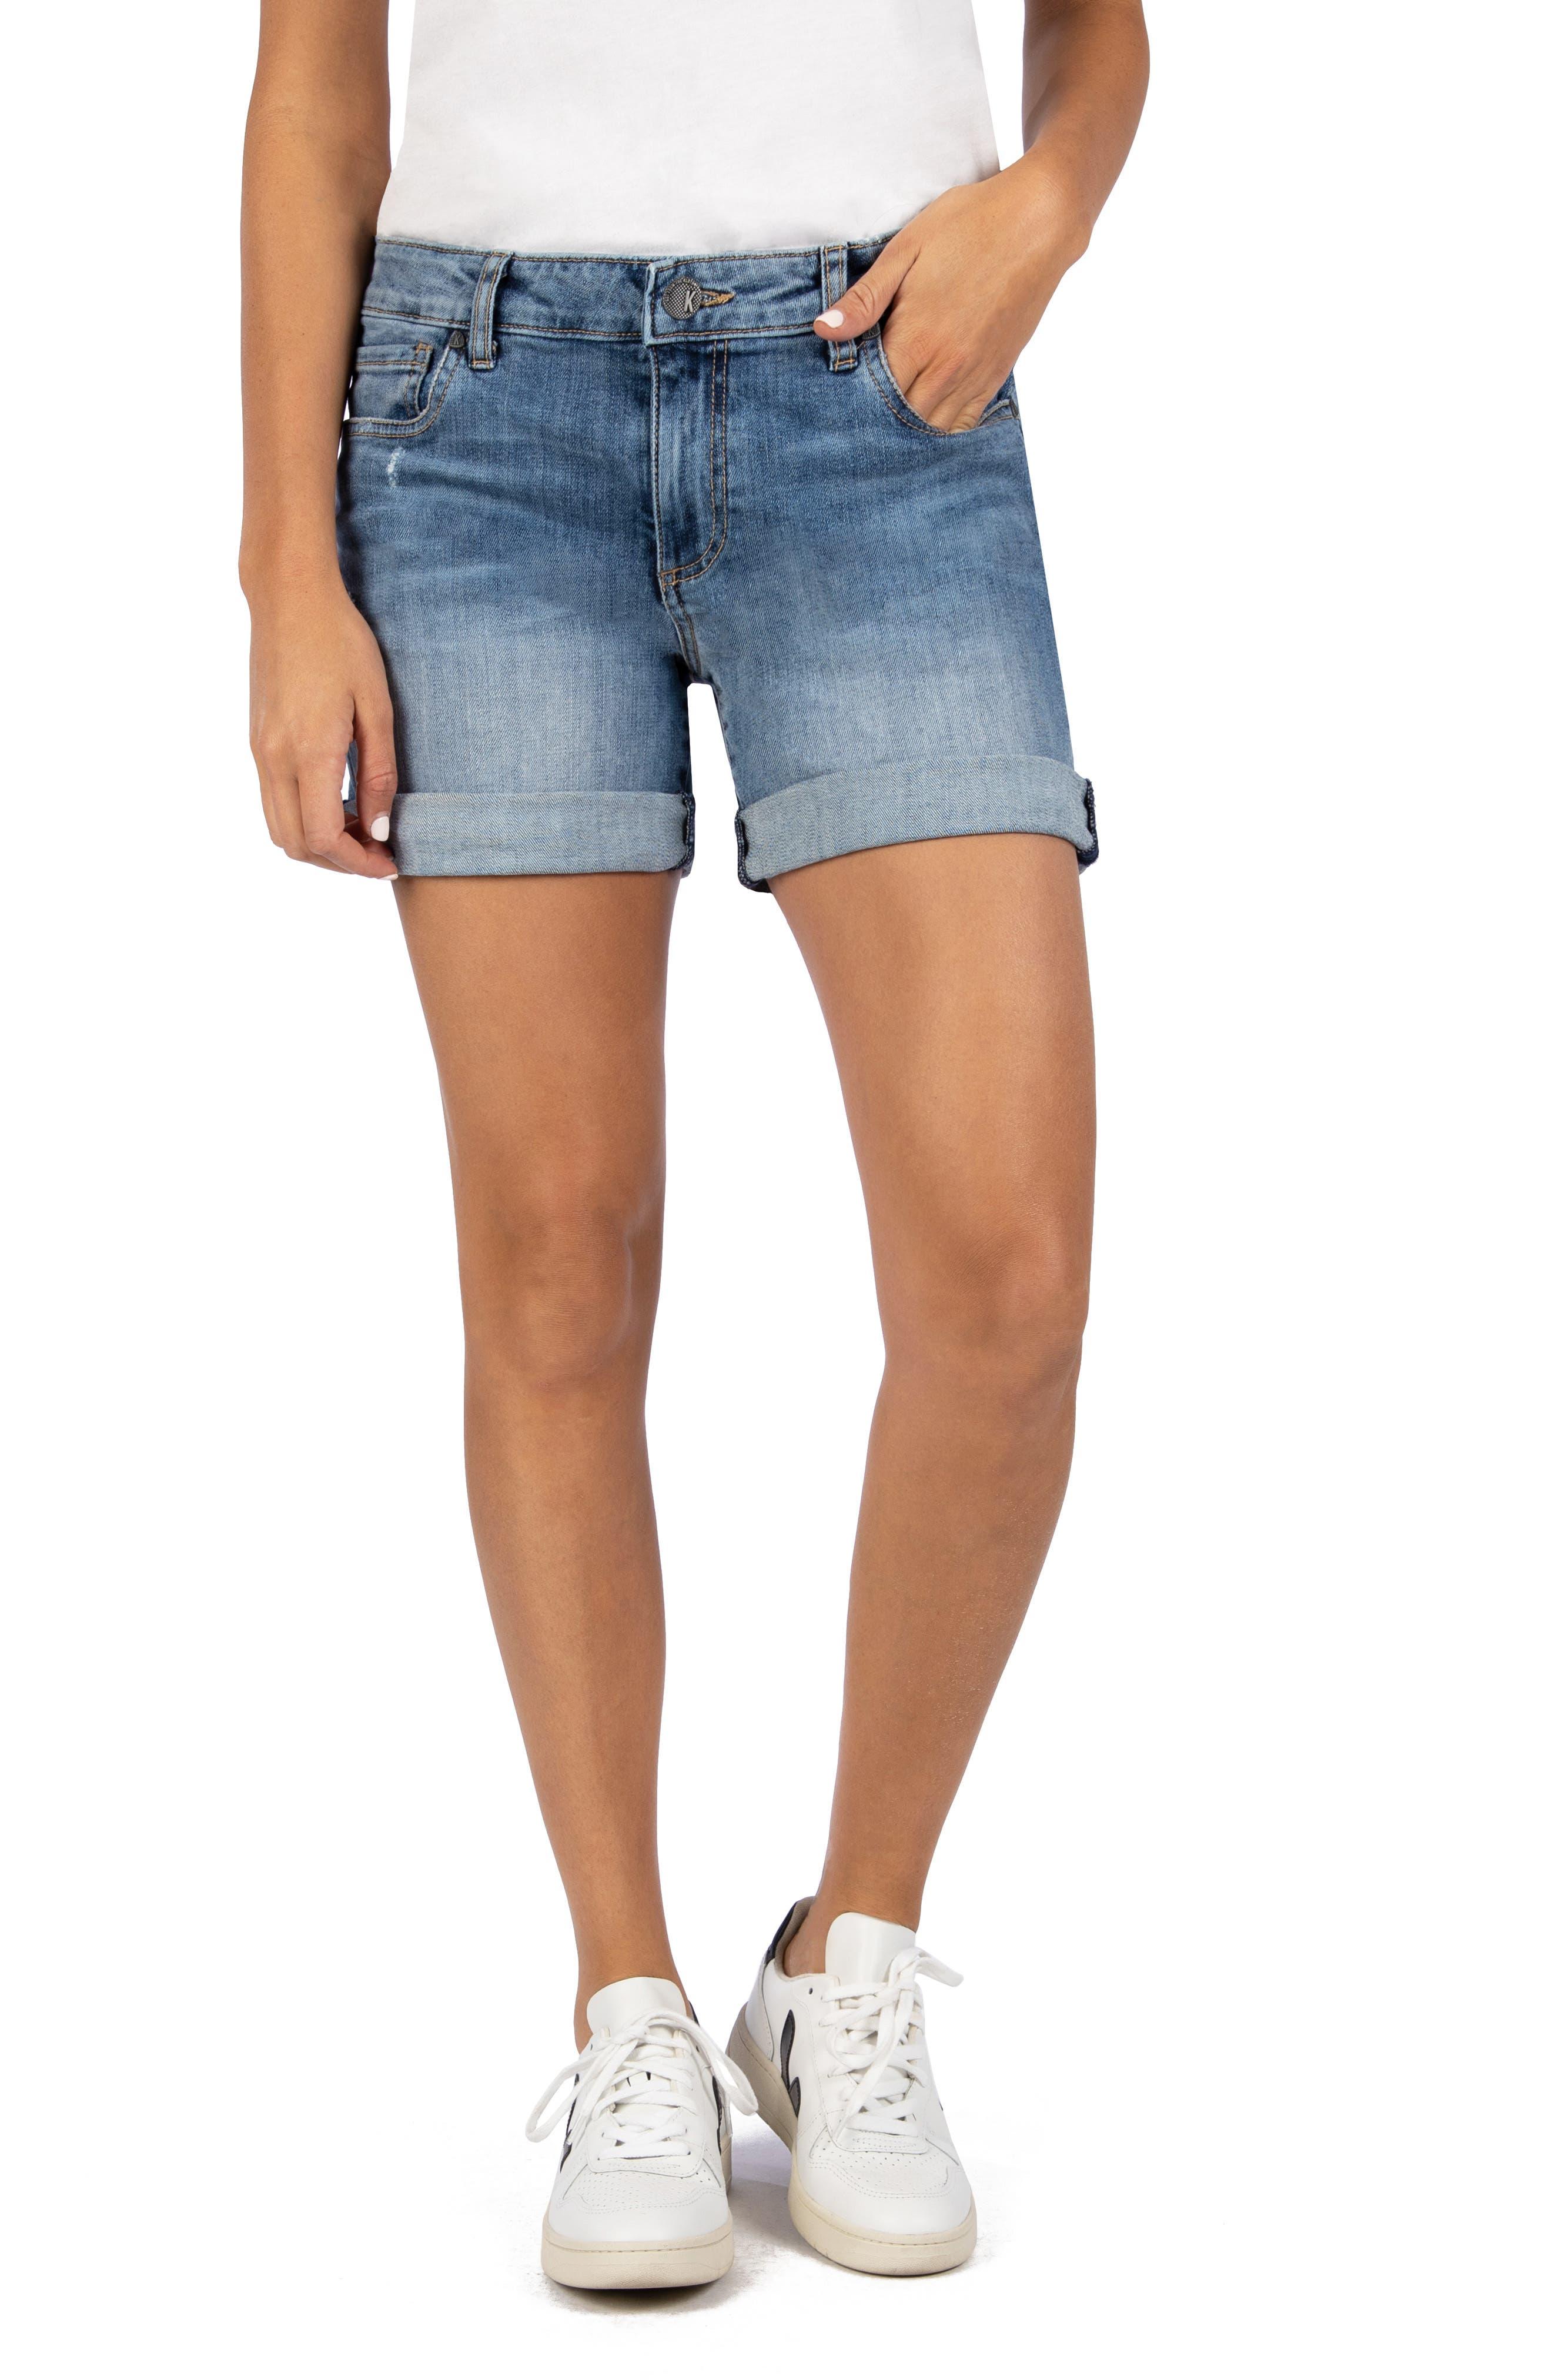 Women's Kut From The Kloth Chloe Boyfriend Roll-Up Denim Shorts